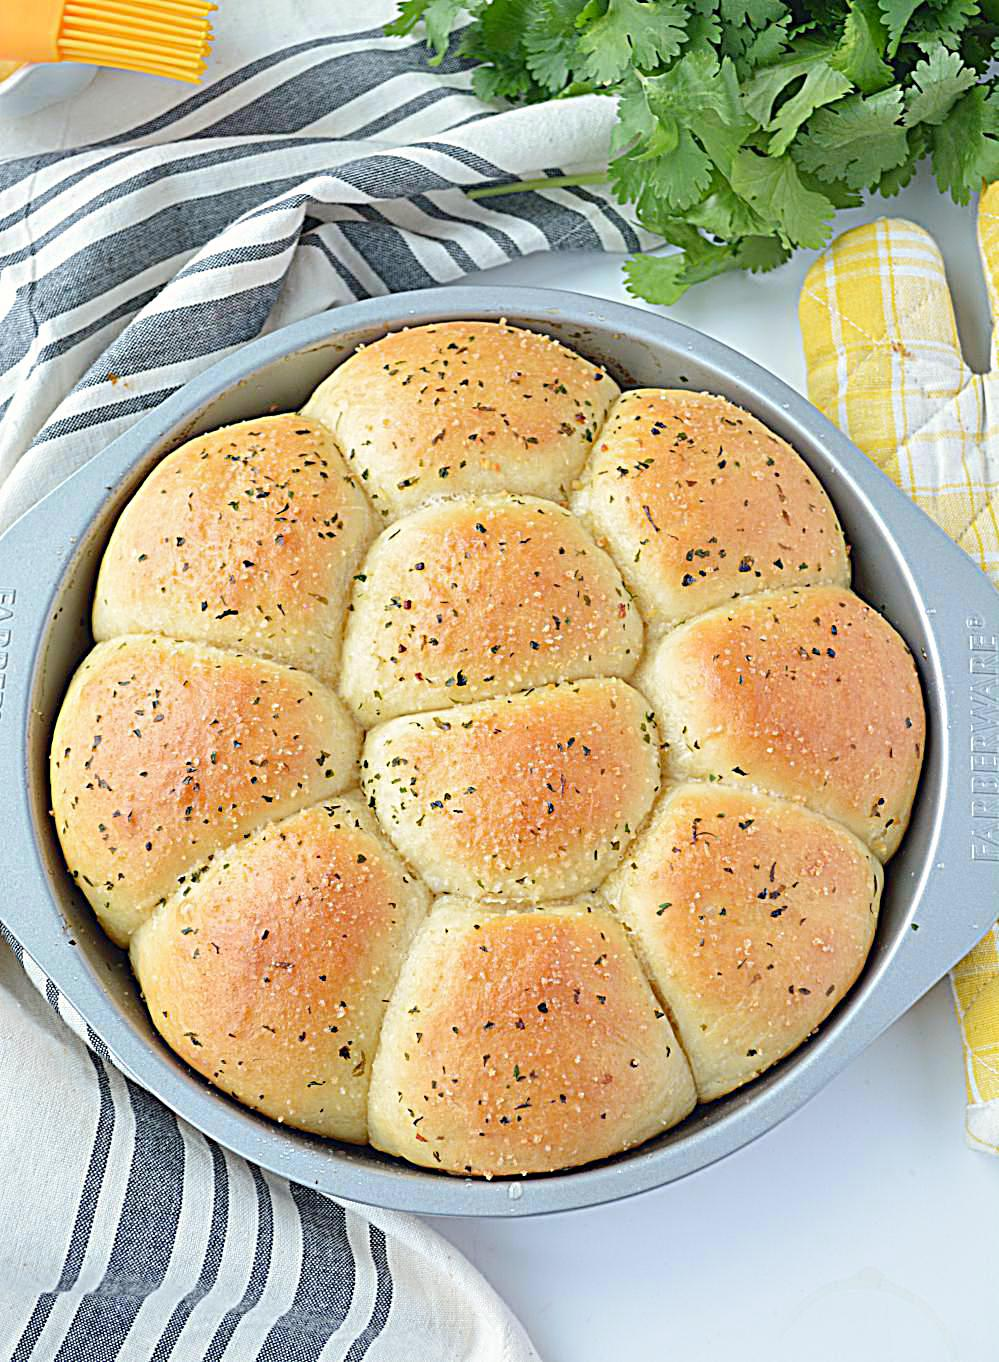 beehive-buns-recipe-12